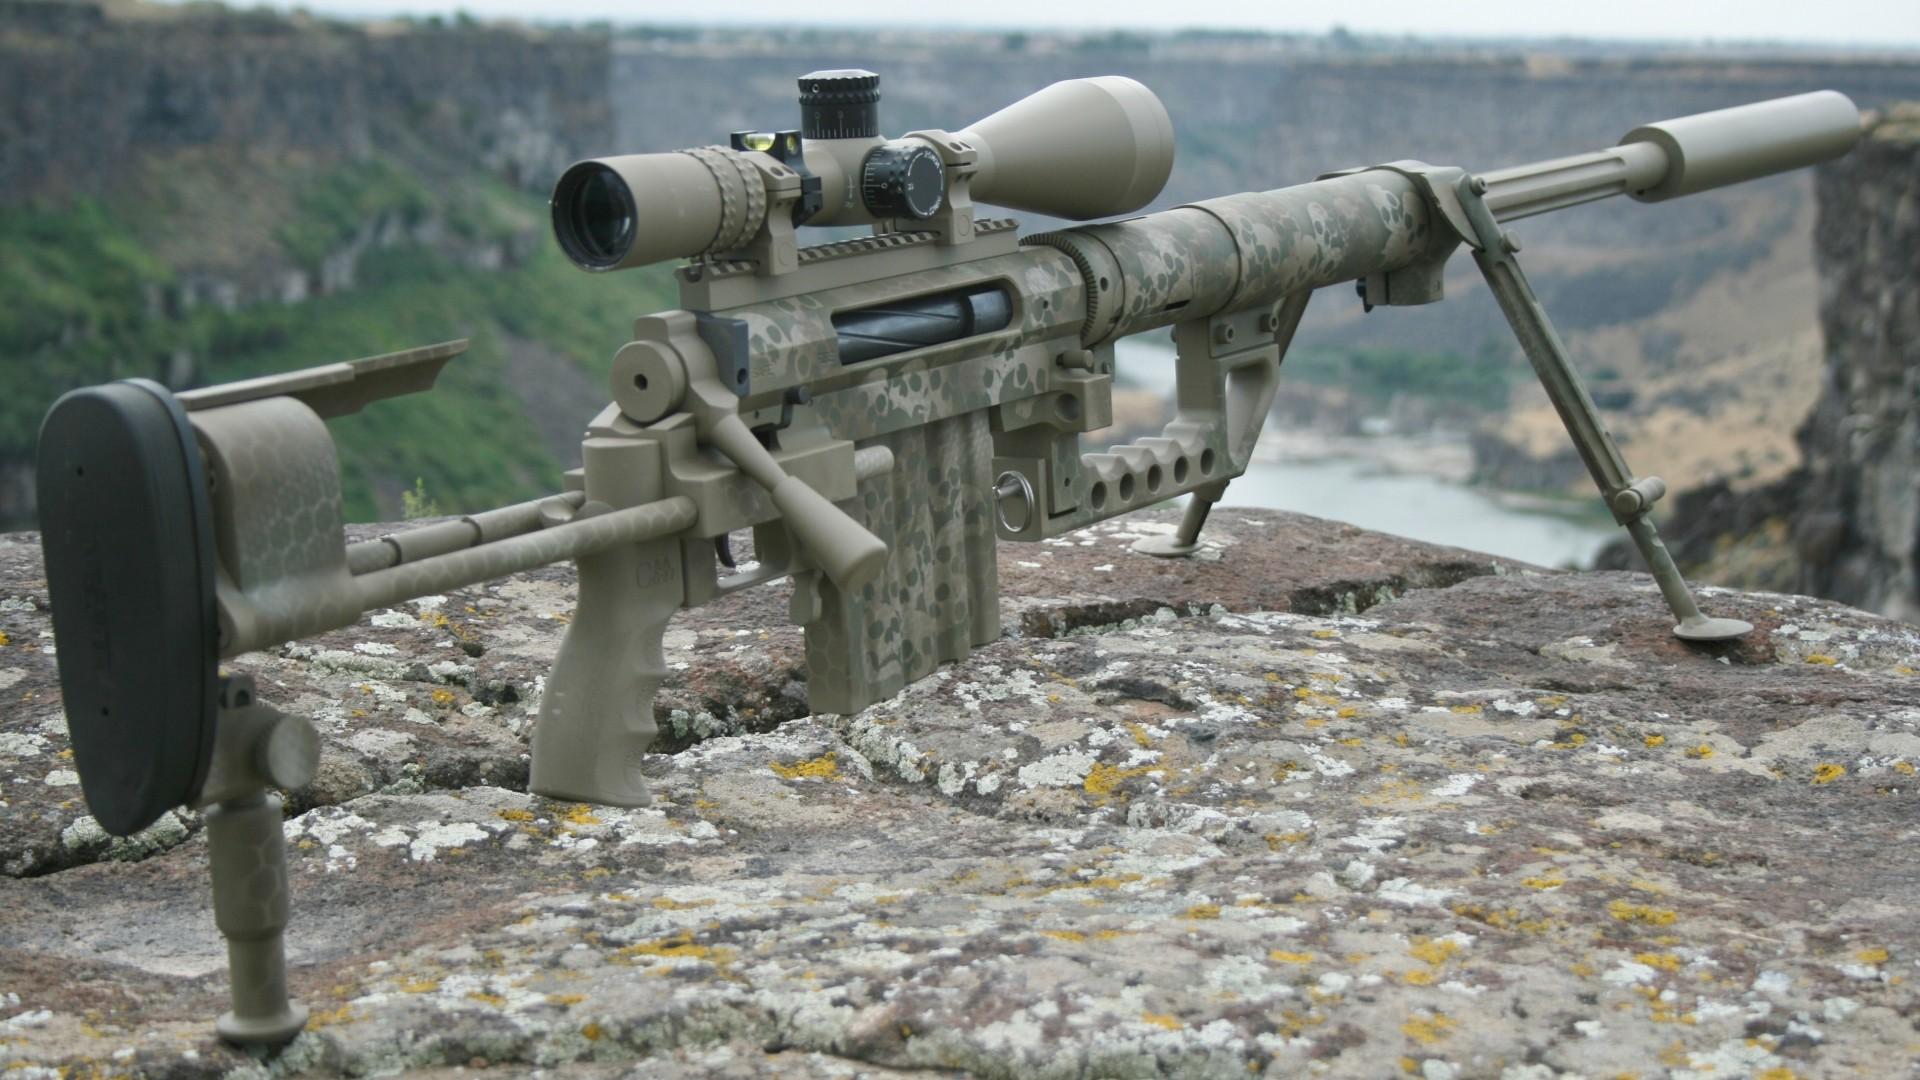 M200 CheyTac Intervention 408 Chey Tac Sniper Rifle Scope